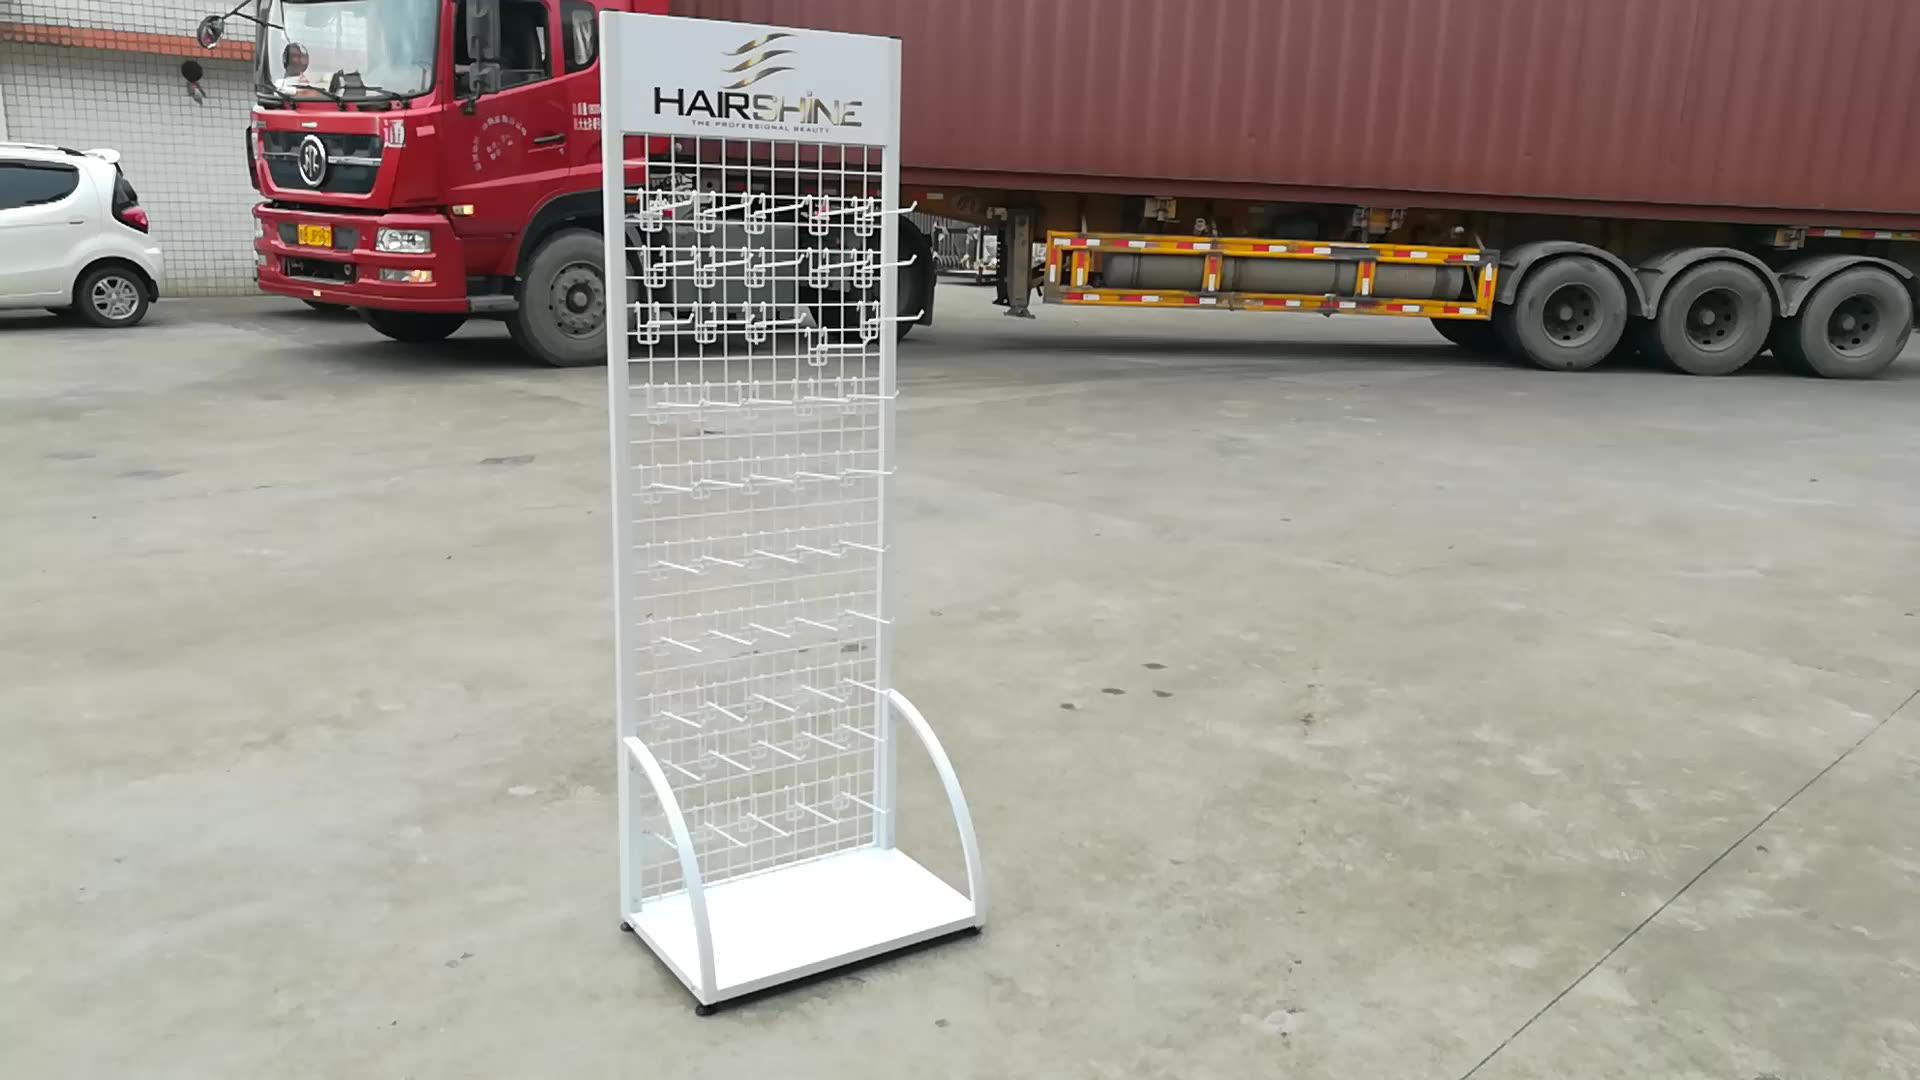 wholesale metal wire mesh basket hook selling merchandiser display rack stand for hanging items